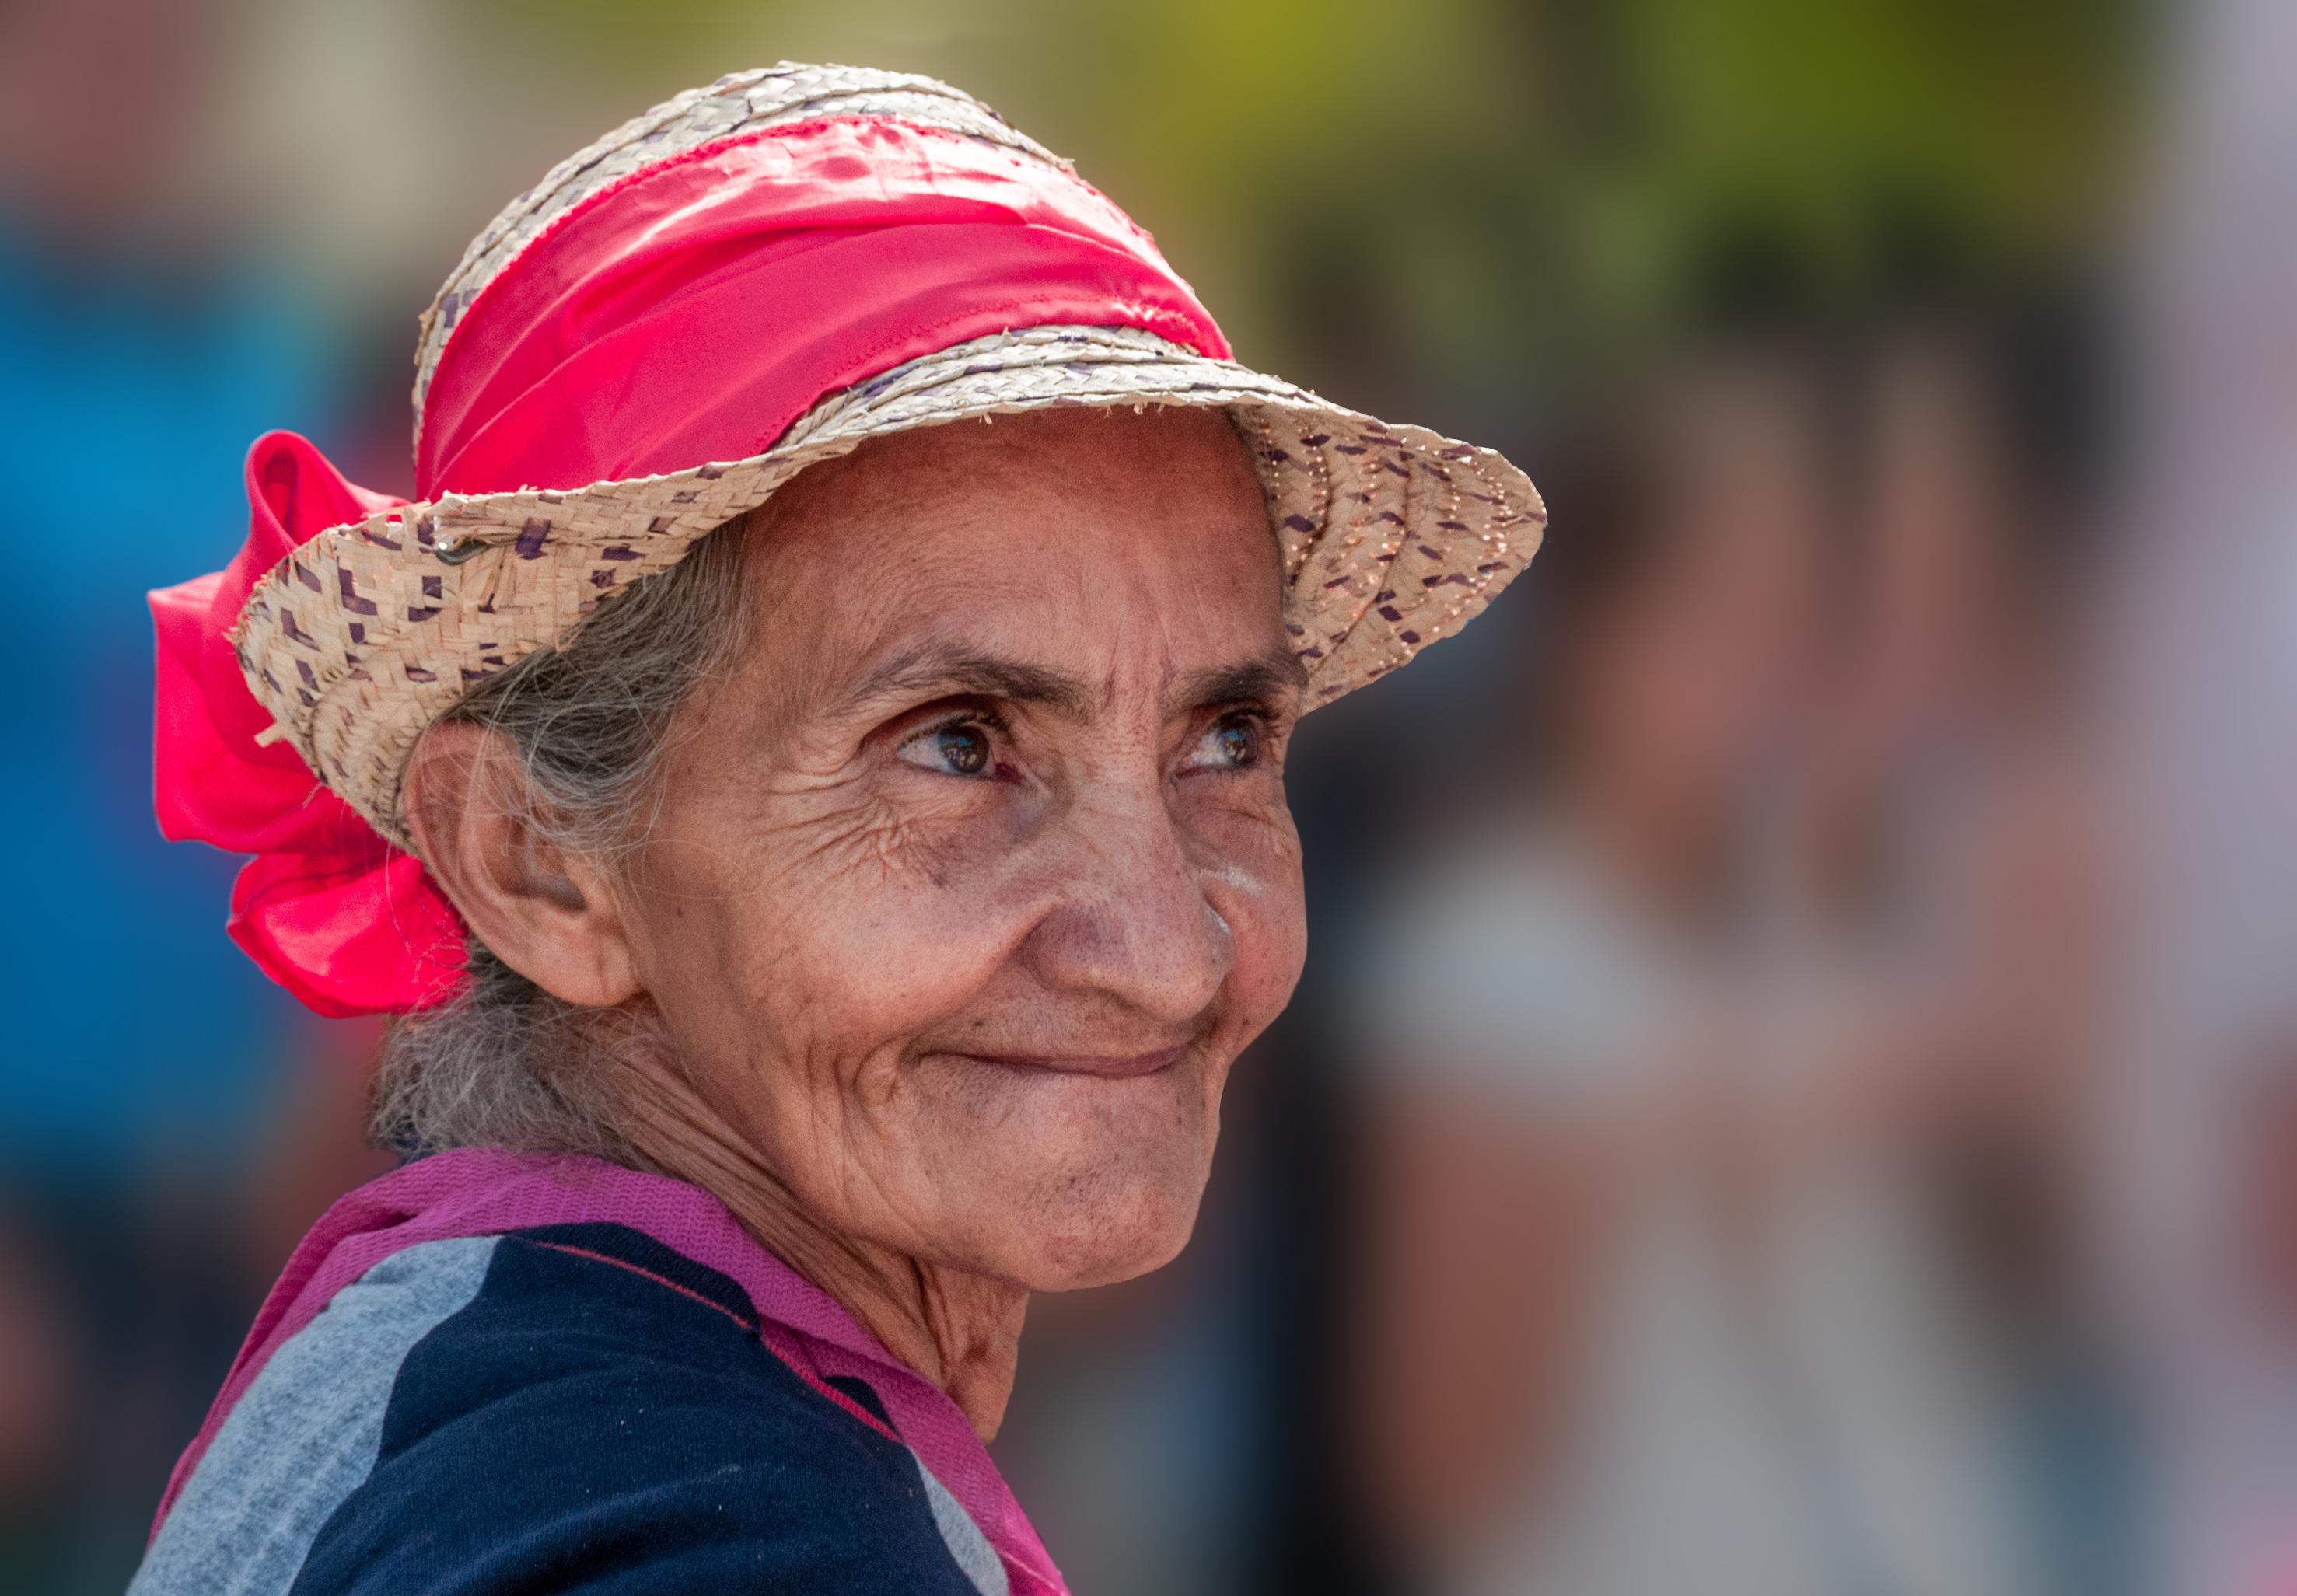 Old lady on beach